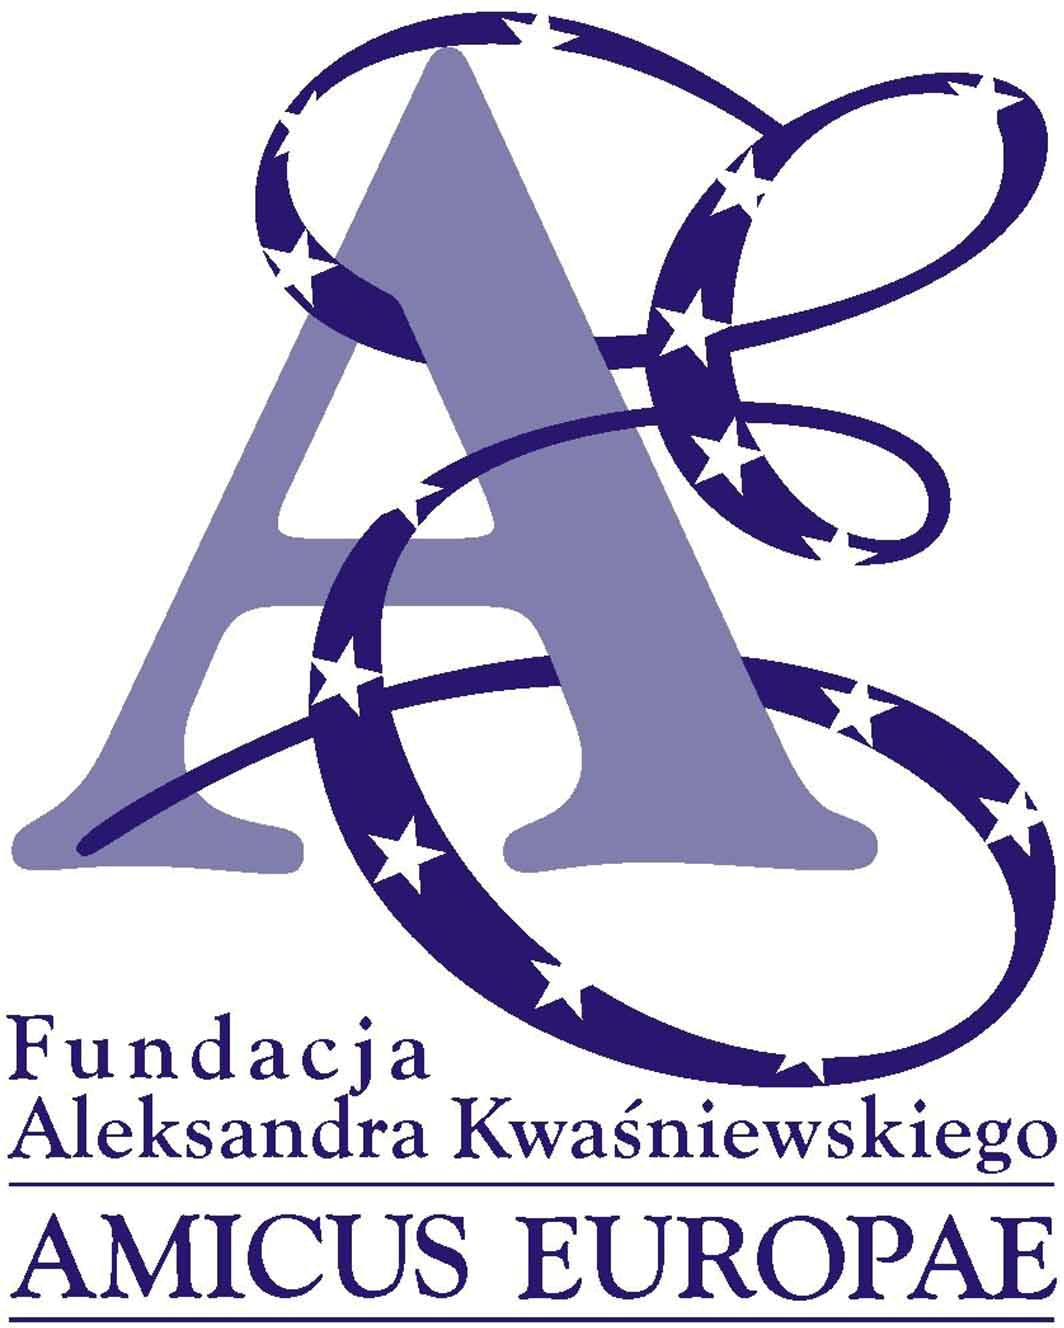 Foundation Amicus Europae